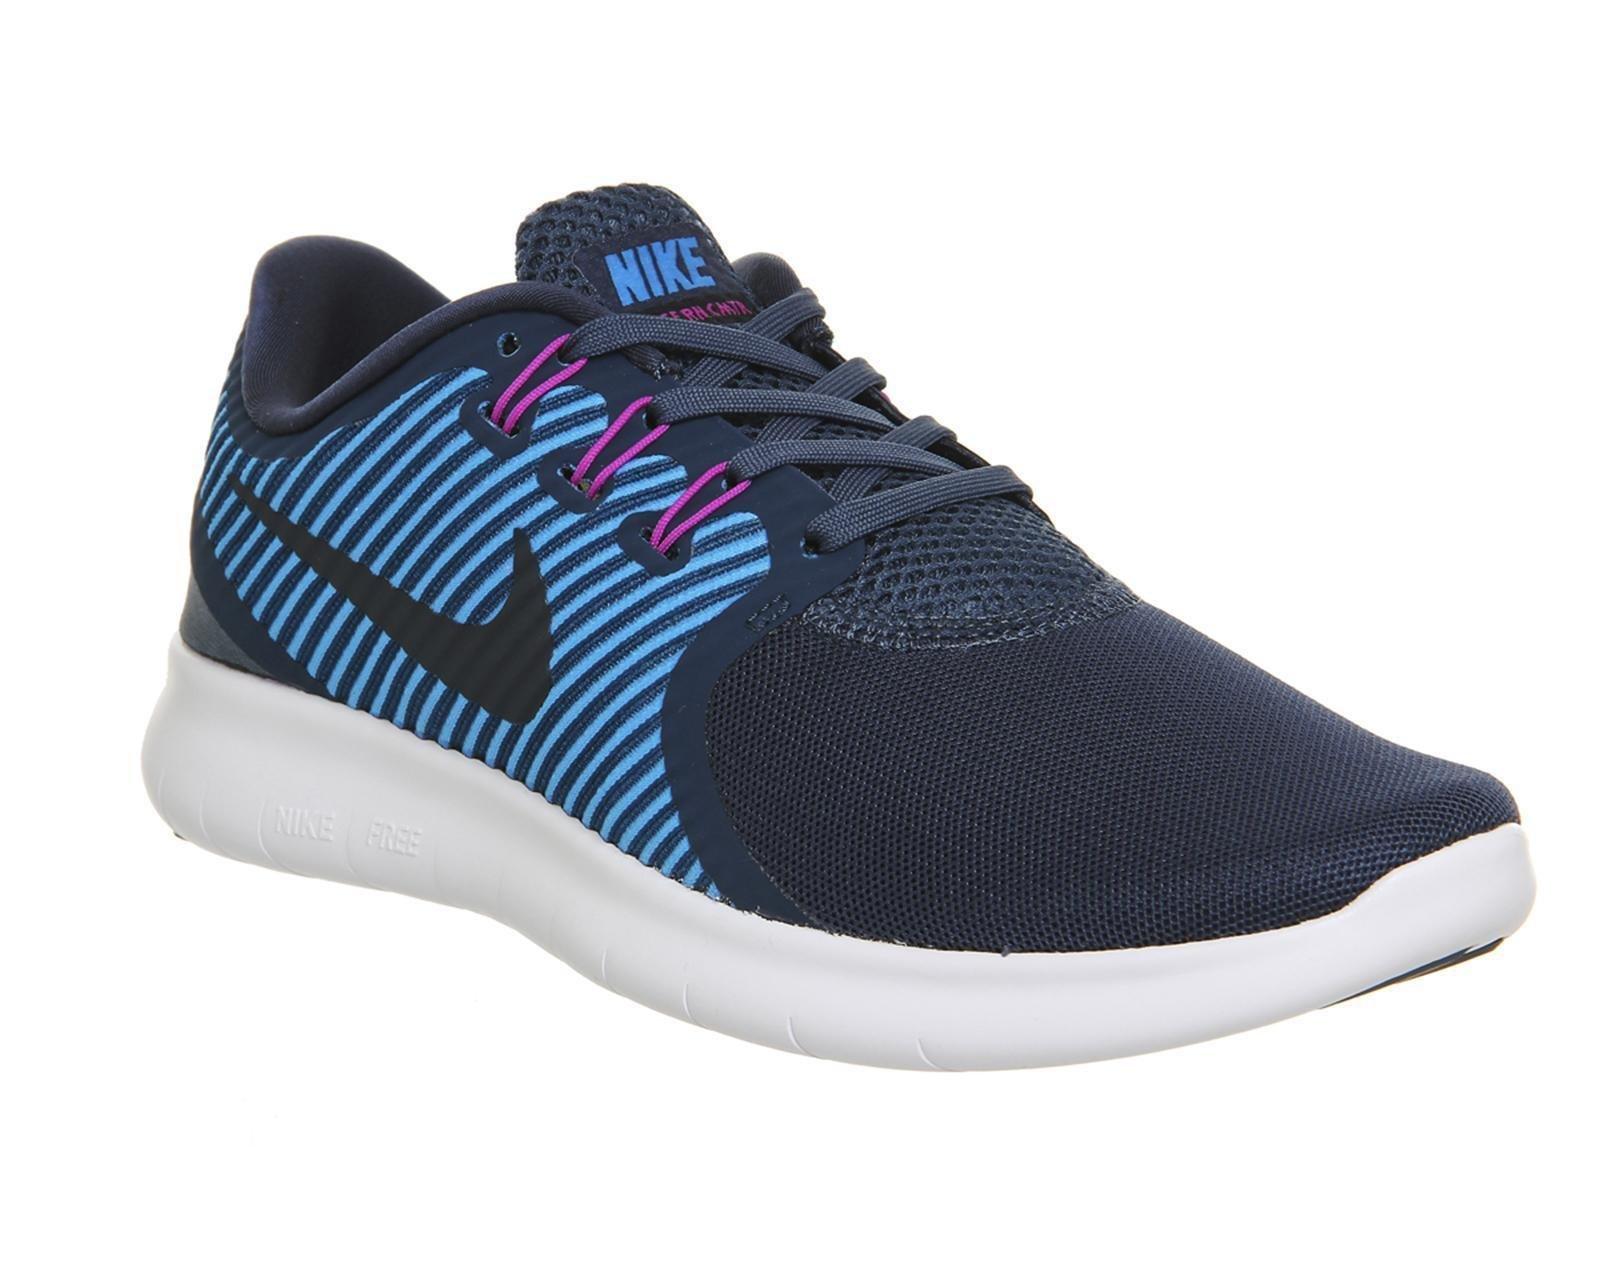 NIKE Women's Shoes Free RN Commuter Running Lightweight Sneaker (7 M US, Squadron Blue/Dark Obsidian)